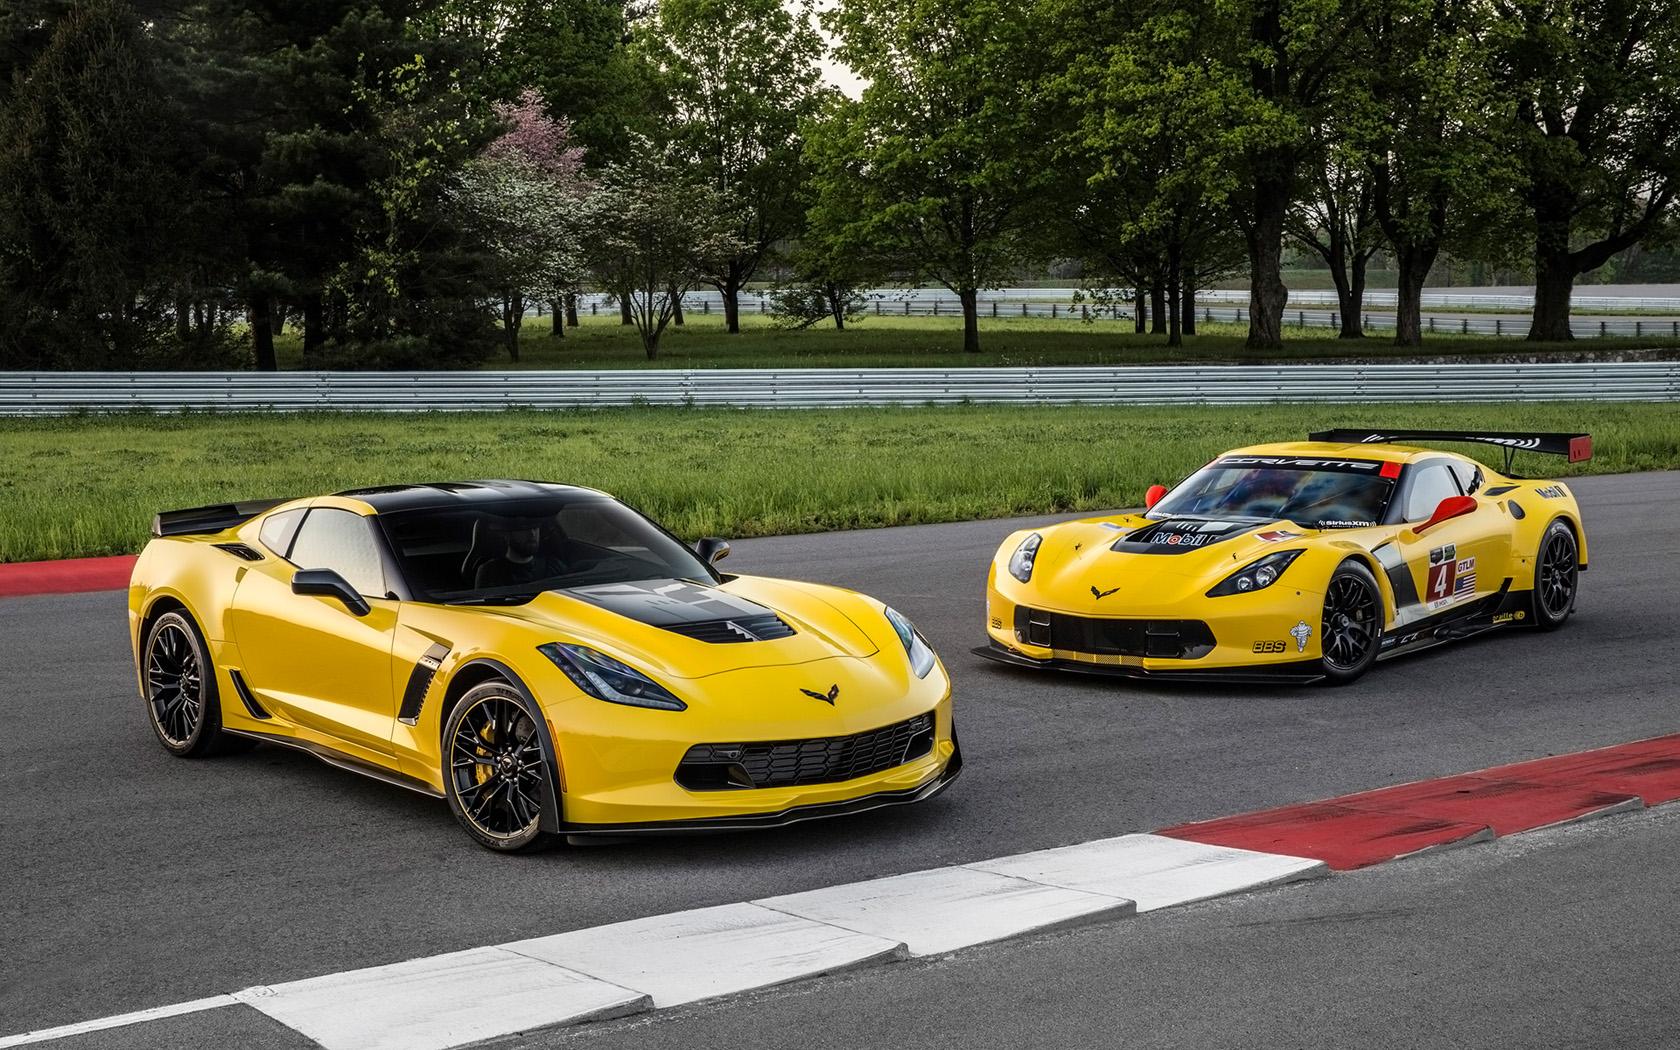 2016 Chevrolet Corvette Z06 C7R Edition   Duo   2   1680x1050 1680x1050